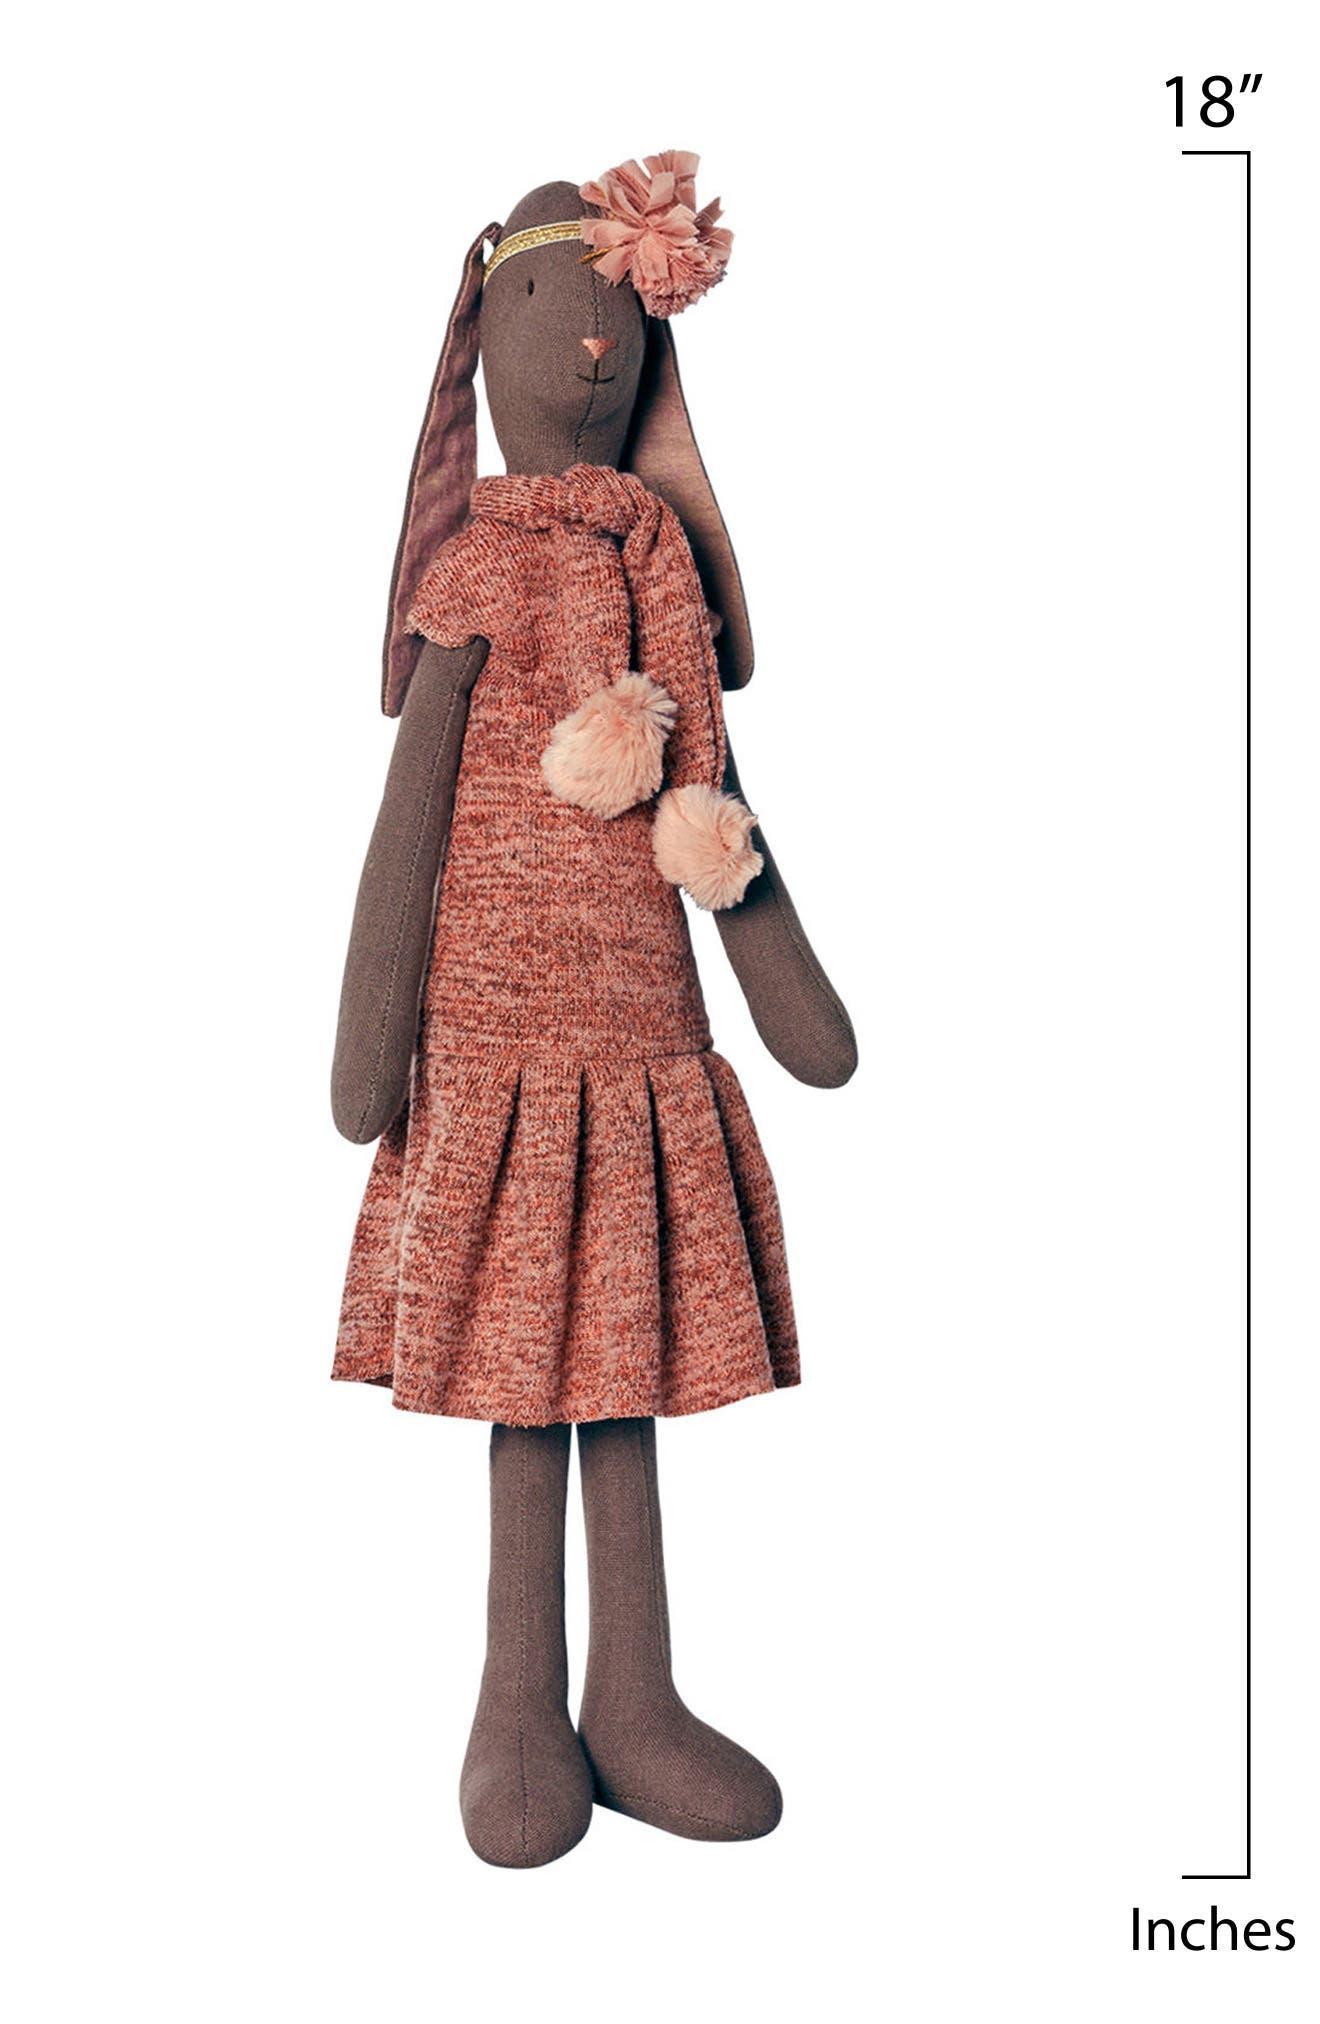 Medium Valerie Bunny Stuffed Animal,                             Alternate thumbnail 2, color,                             200